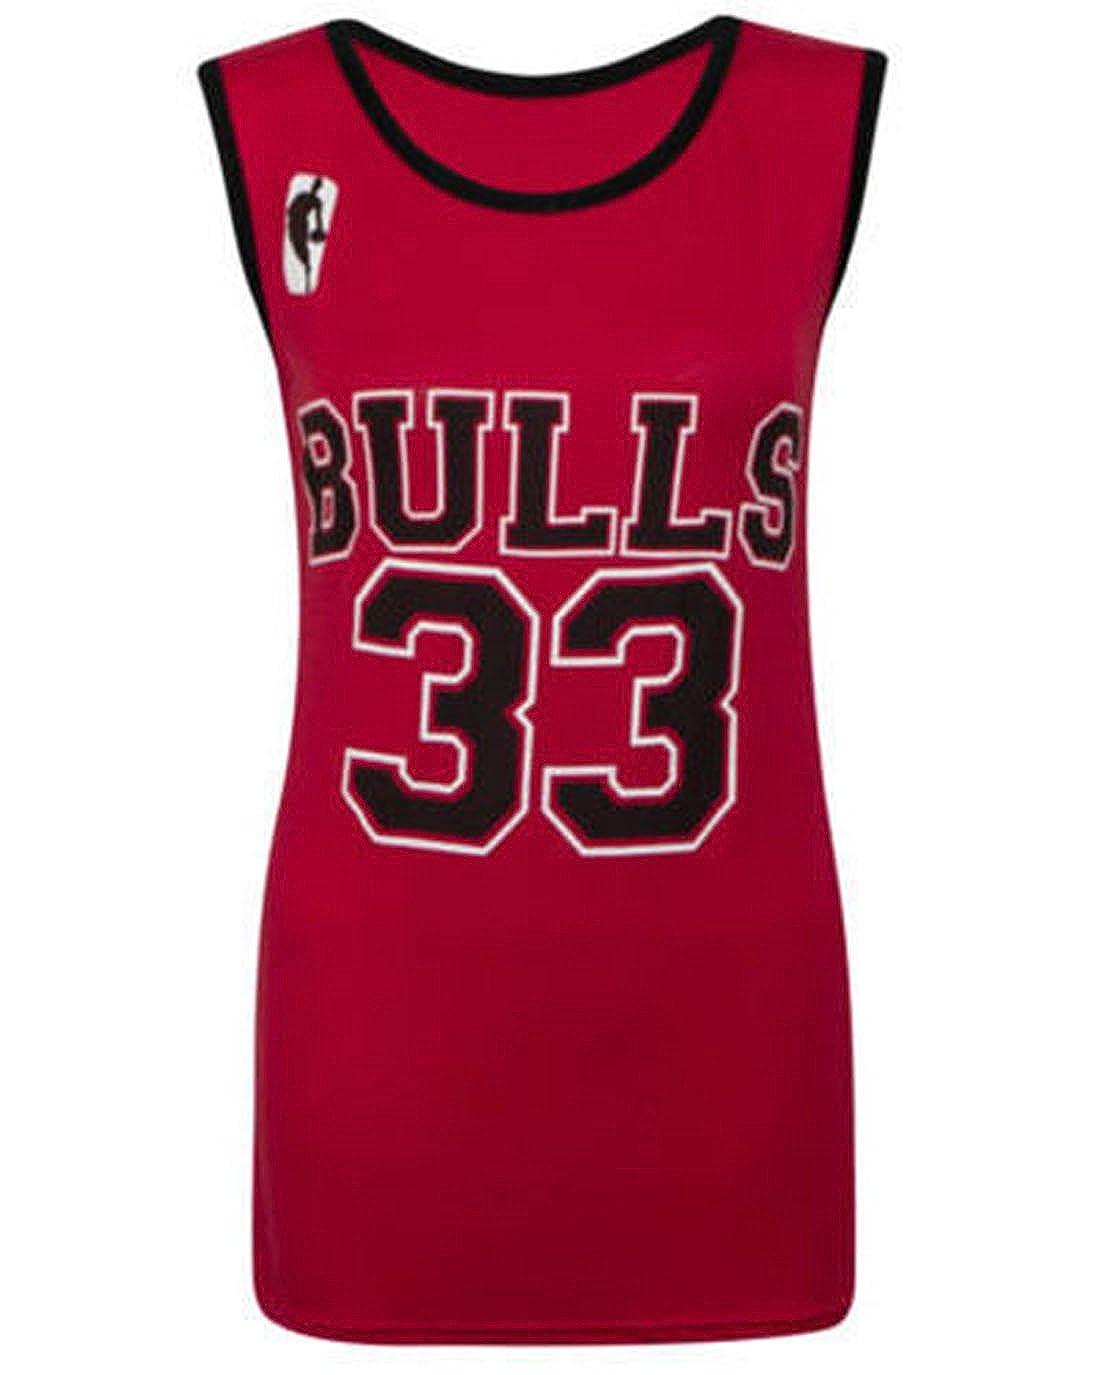 Funky Fashion New Ladies Gym Workout BULLS 33 Varsity Print T Shirt Vest  Brallet 8-14: Amazon.co.uk: Clothing